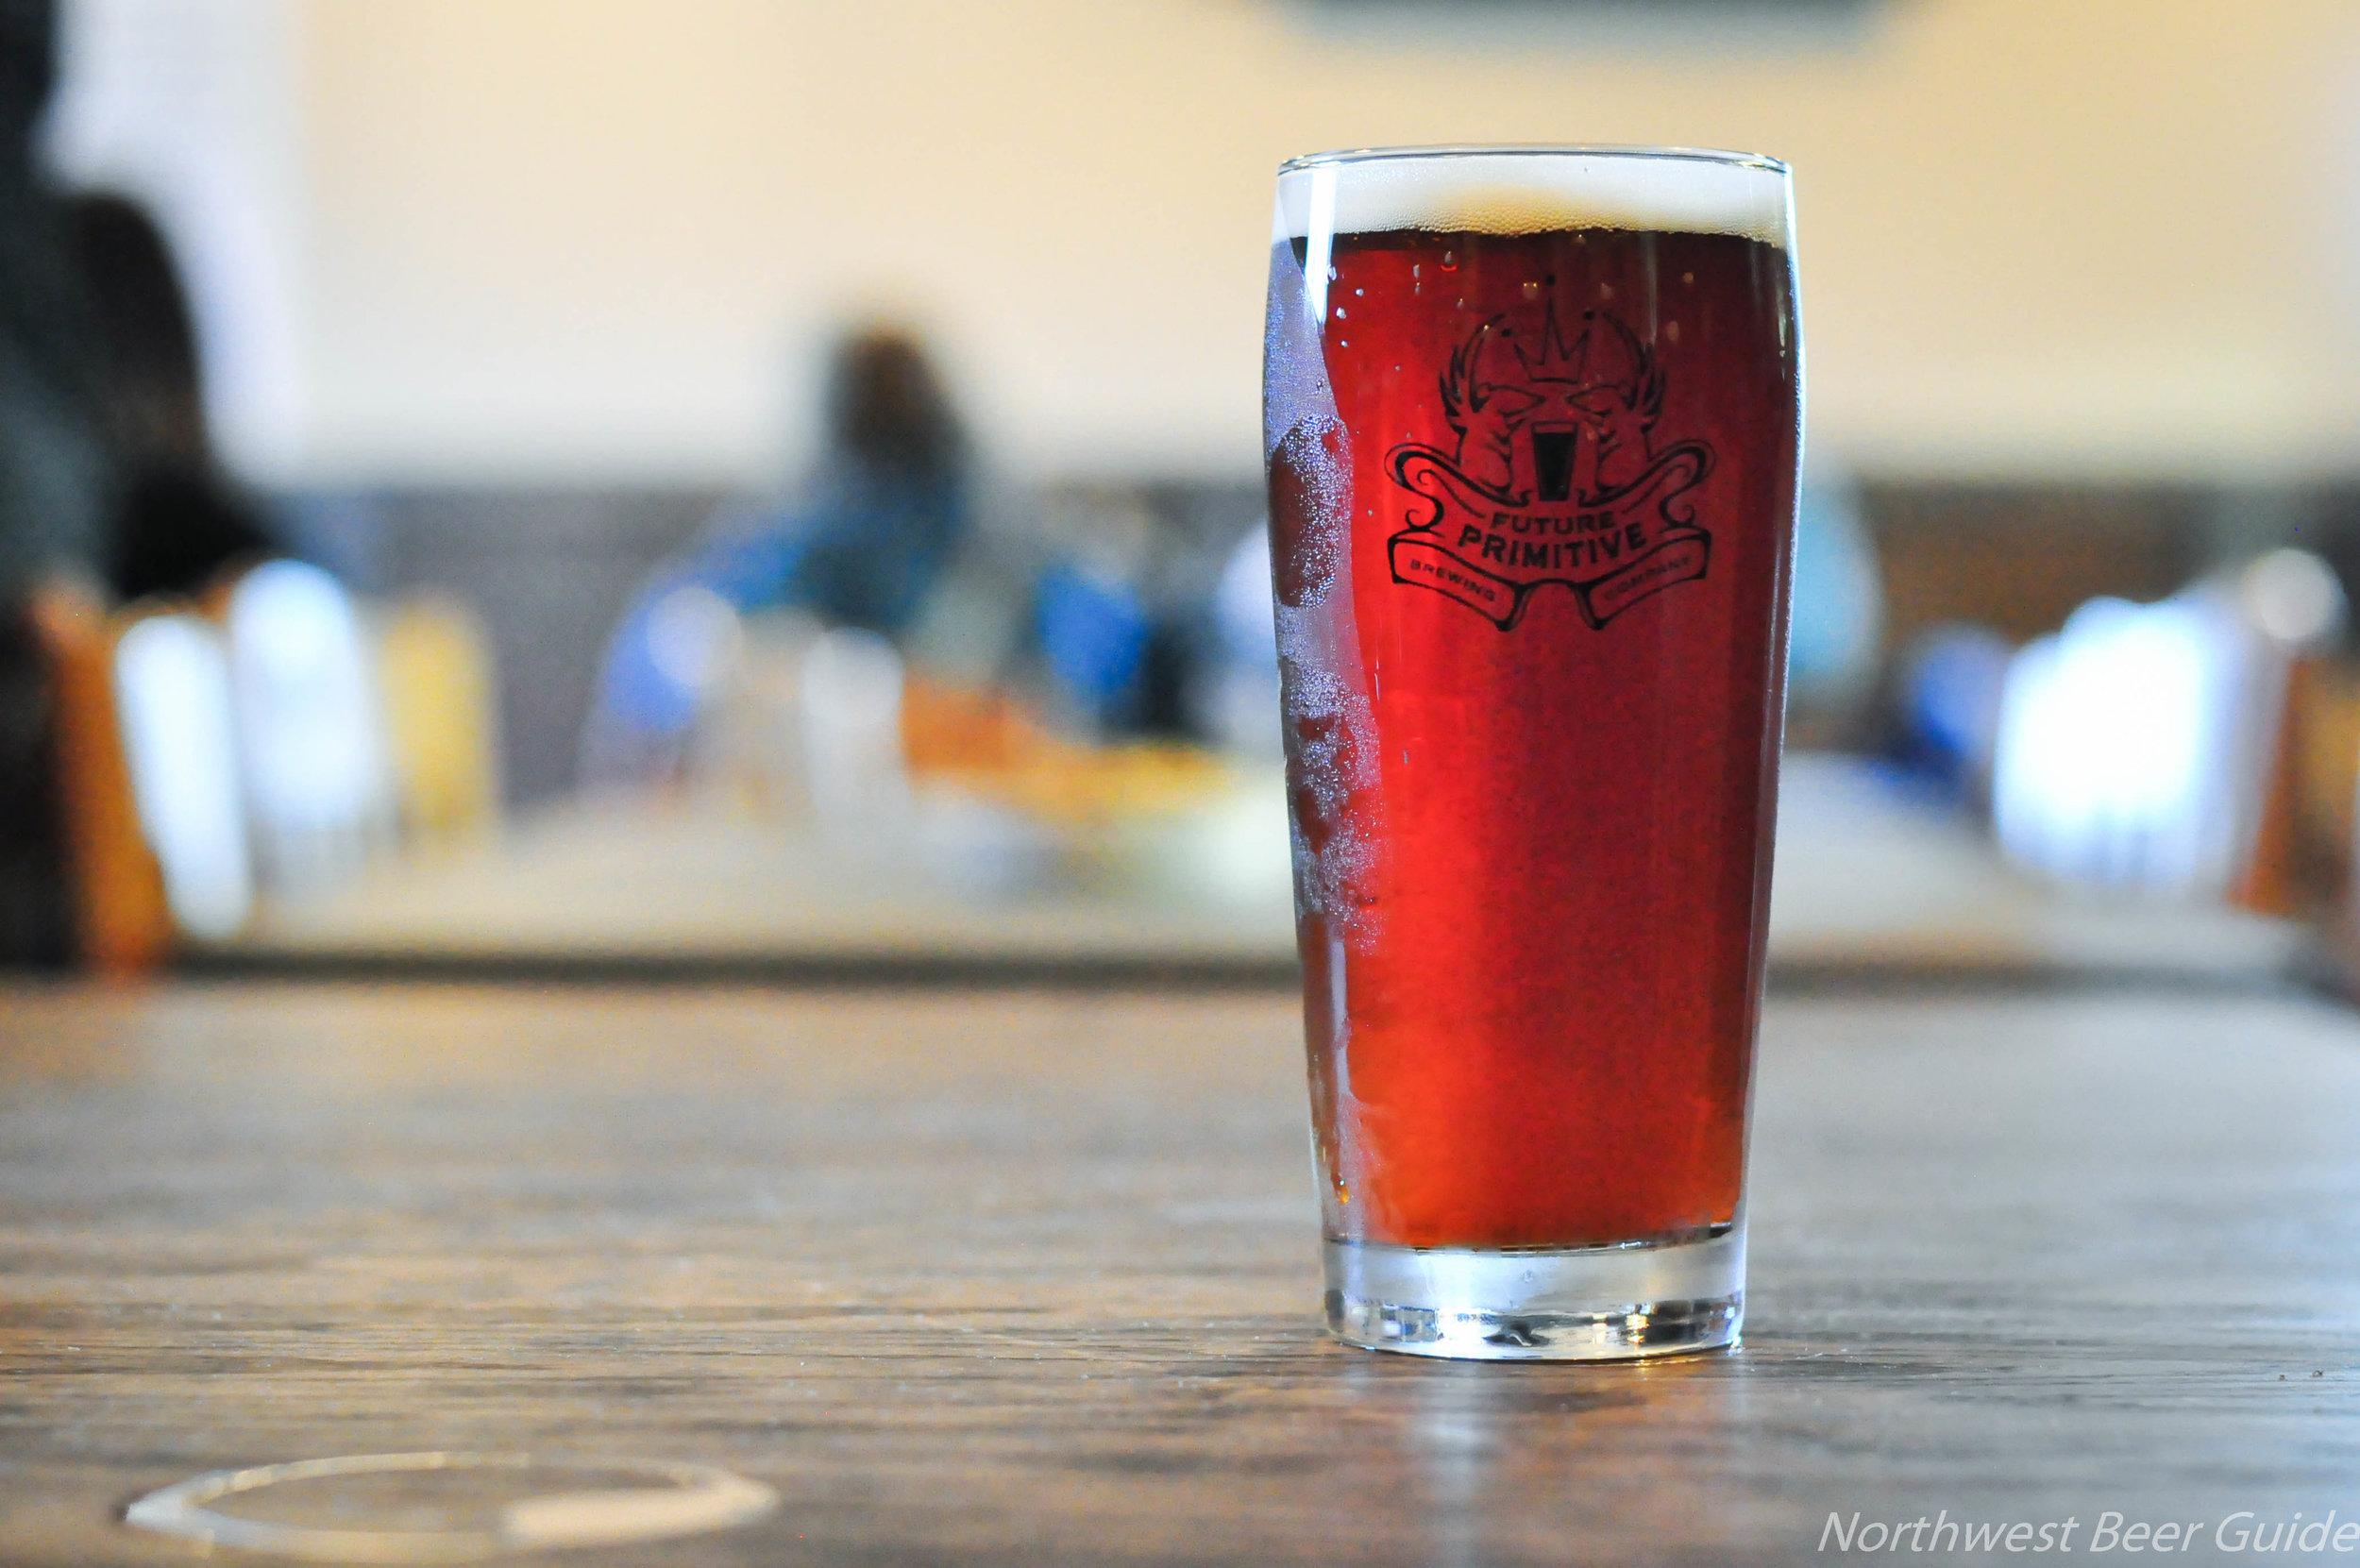 Copyright Northwest Beer Guide